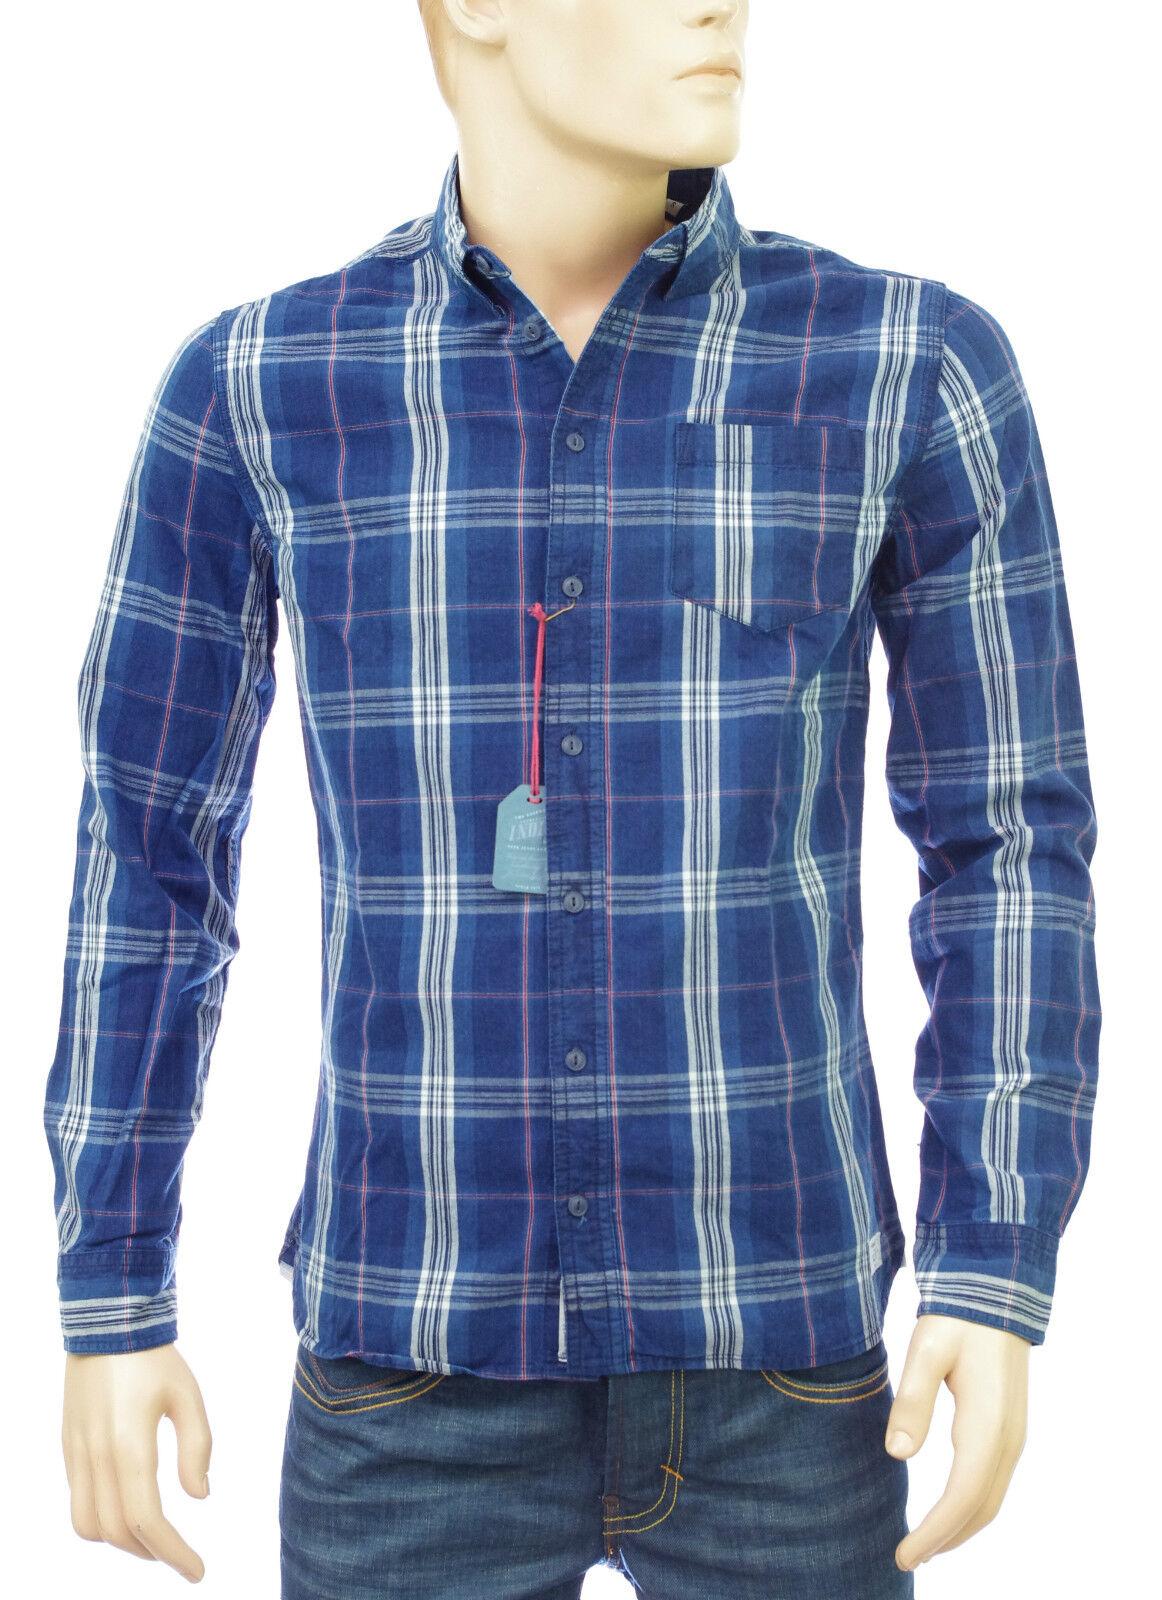 PEPE JEANS chemise carreaux homme HORN INDIGO PM301851 blu